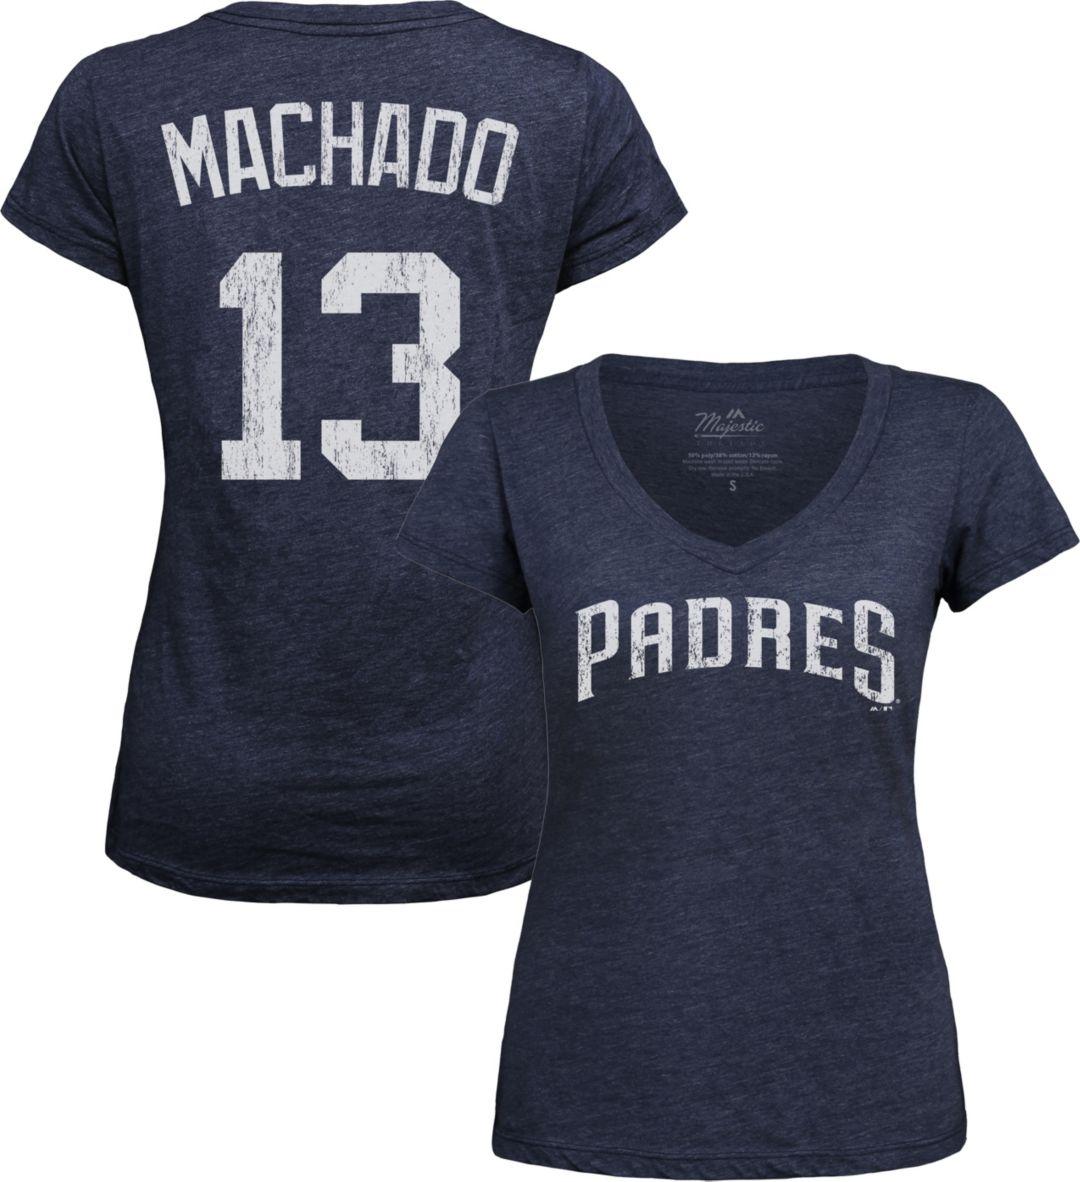 huge discount 3dbcf 8849b Majestic Threads Women's San Diego Padres Manny Machado V-Neck T-Shirt